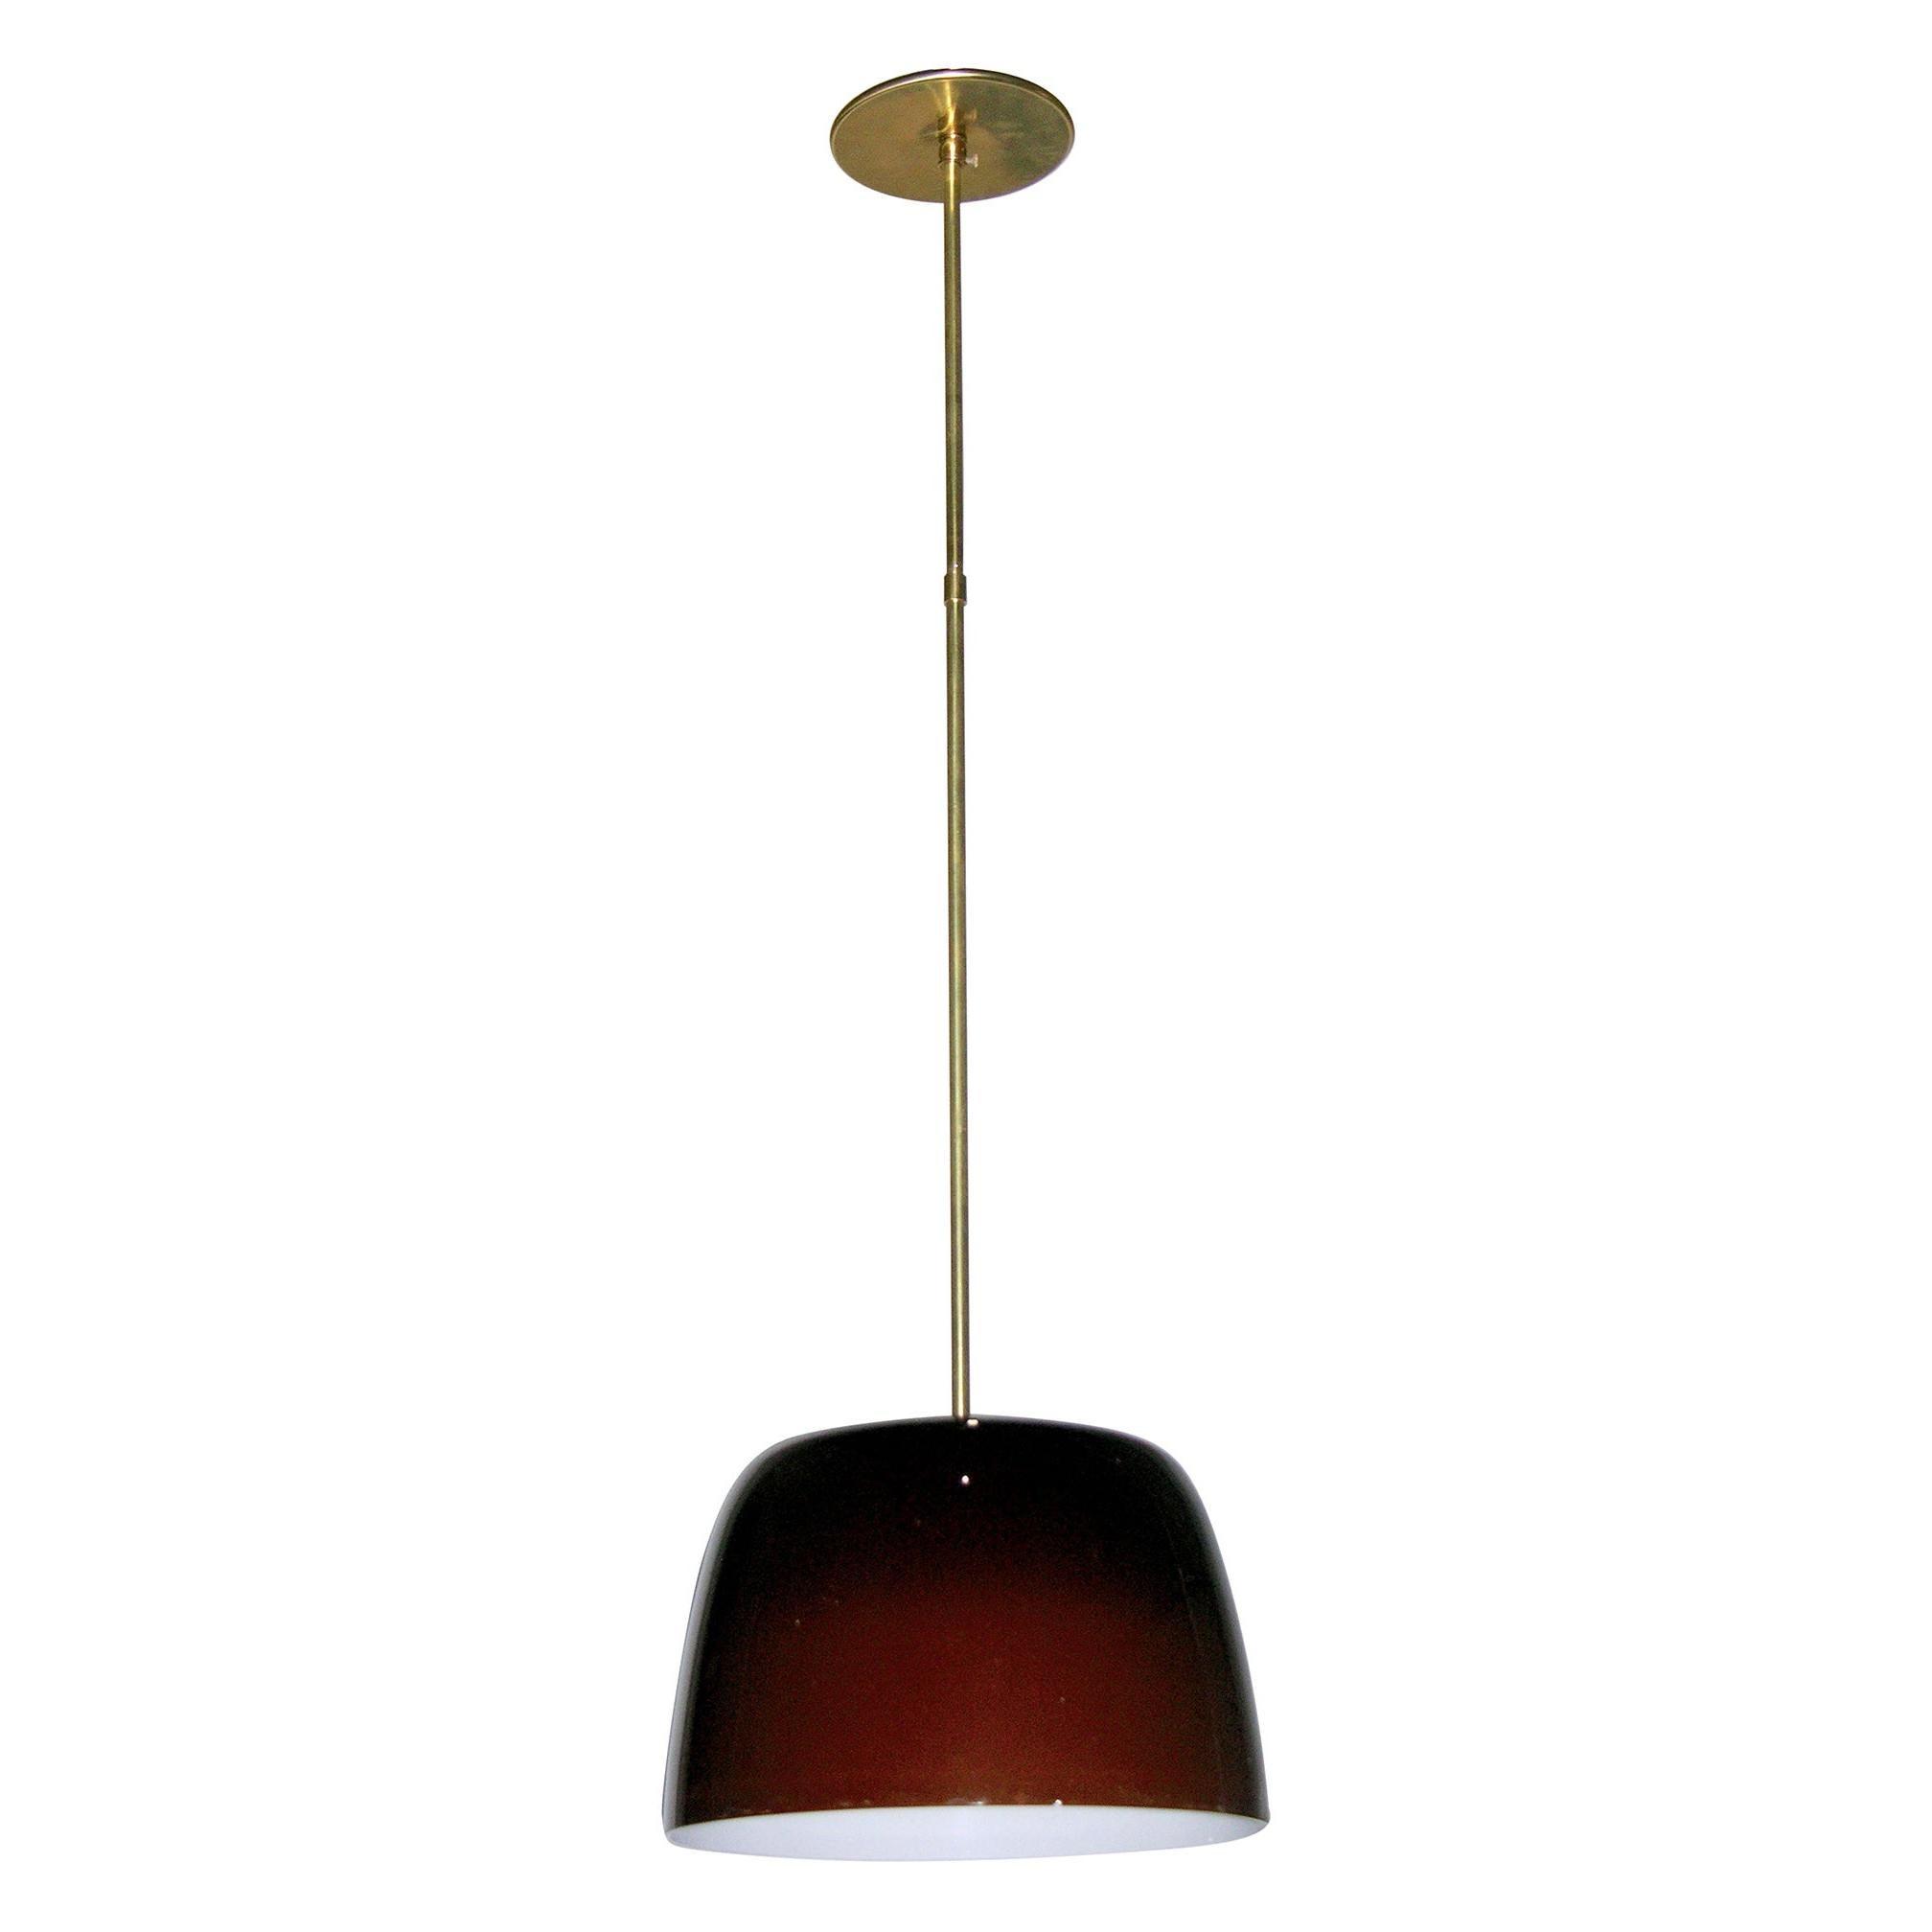 Italian Minimalist Brass and Coffee Brown Murano Glass Pendant Light, 1970s